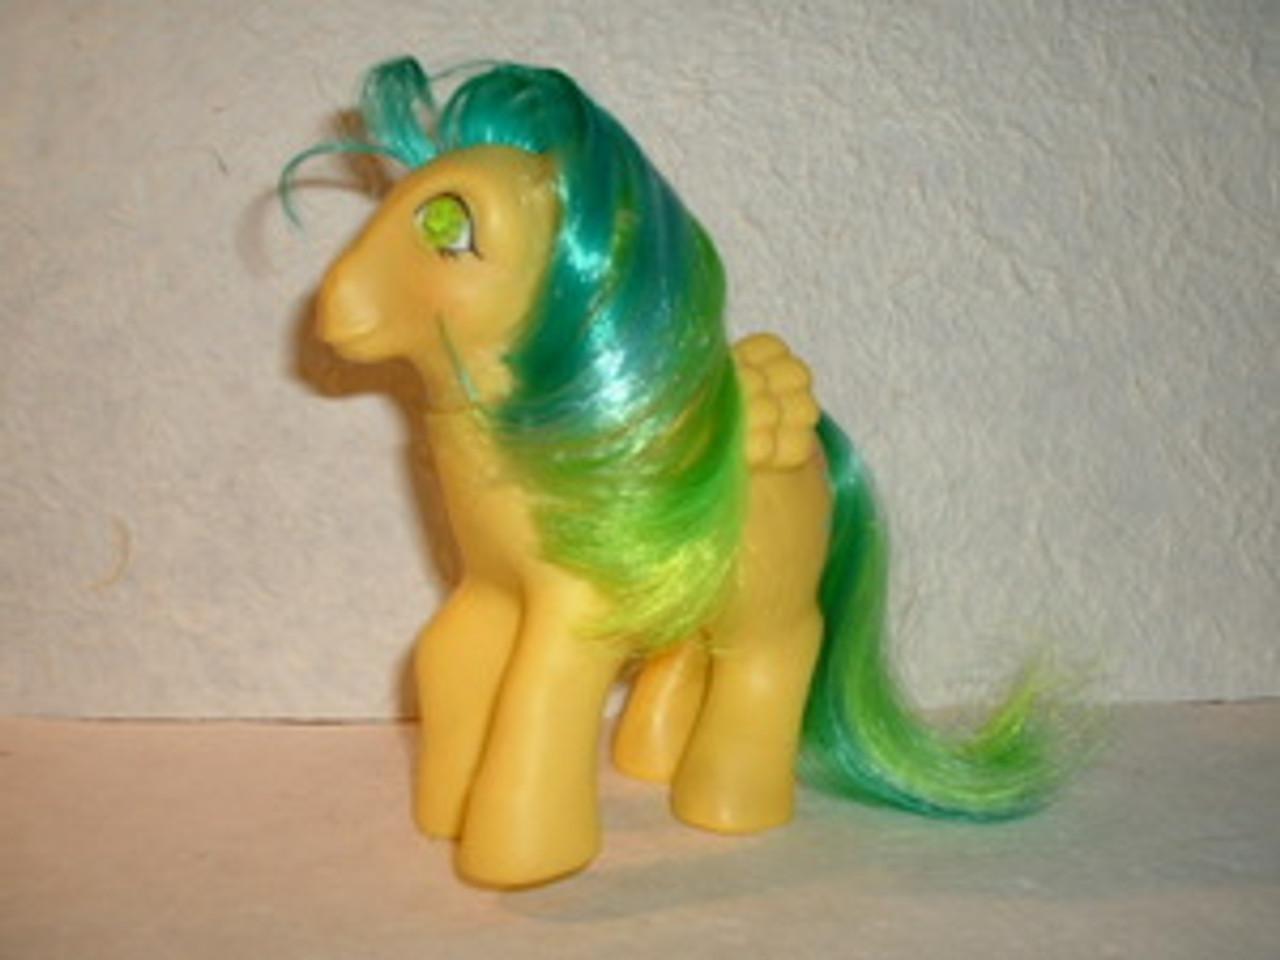 SeaGlow 55 KatSilk Saran Doll Hair